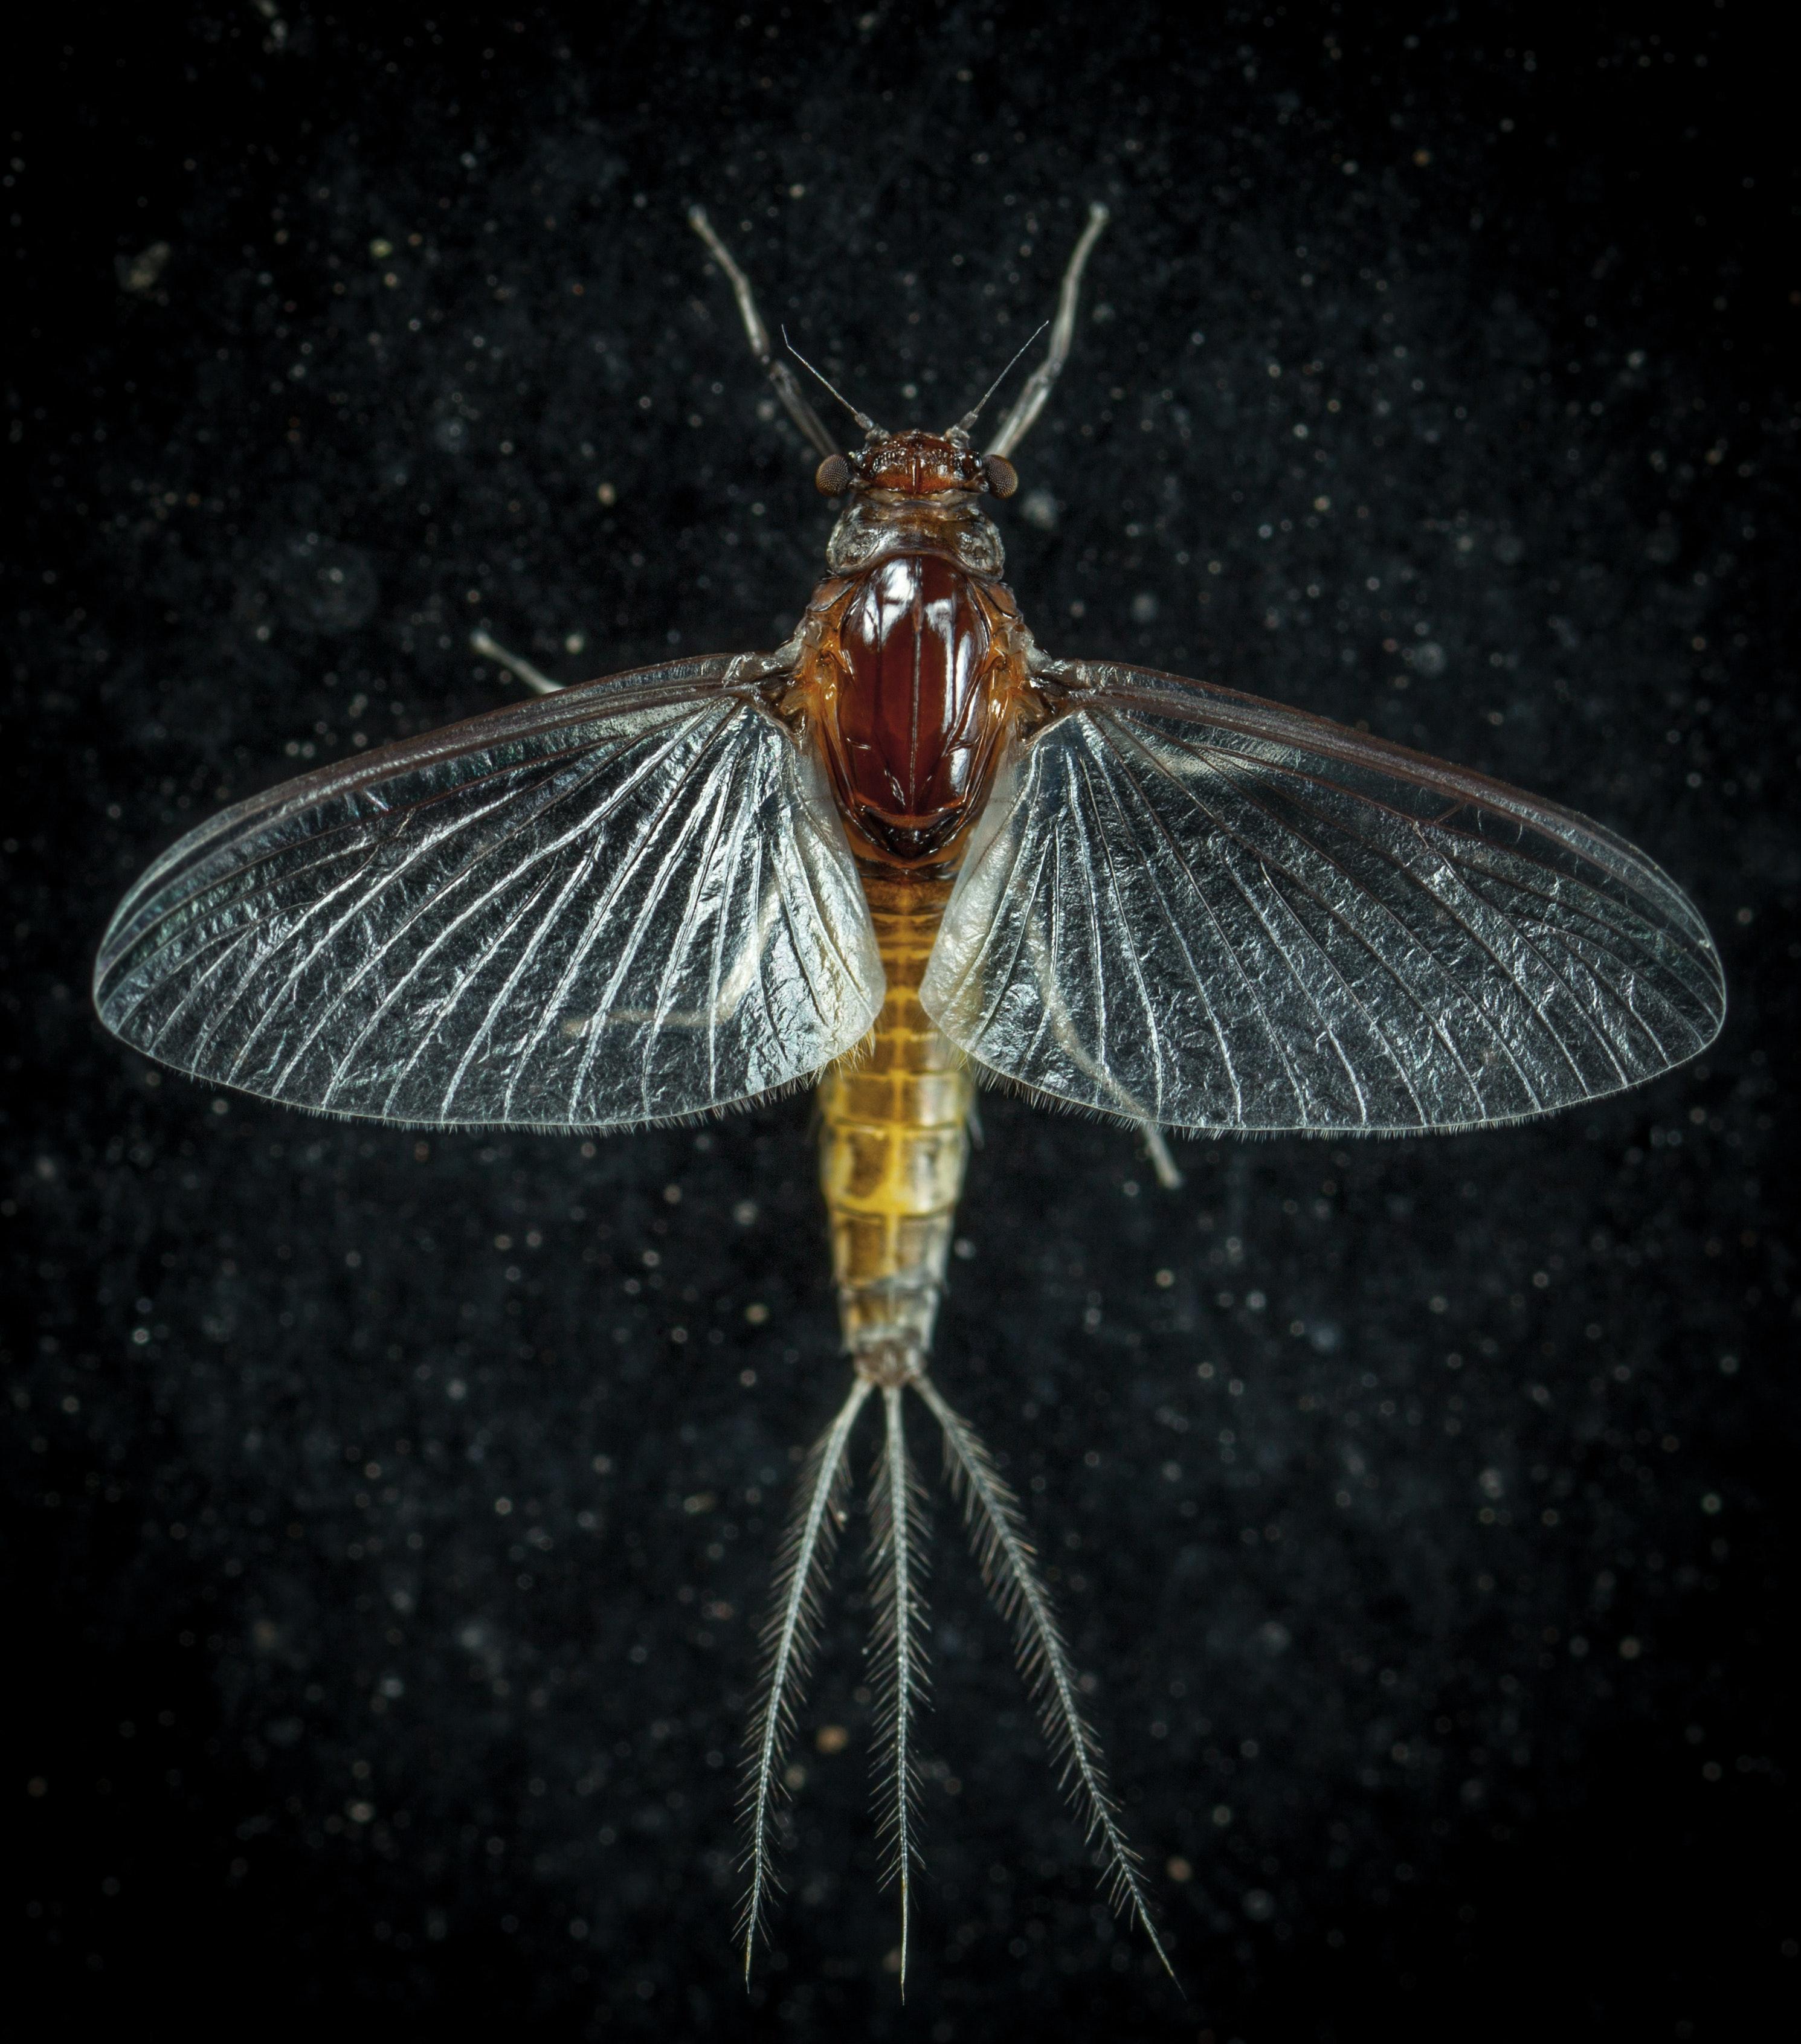 Closeup photo of mayfly